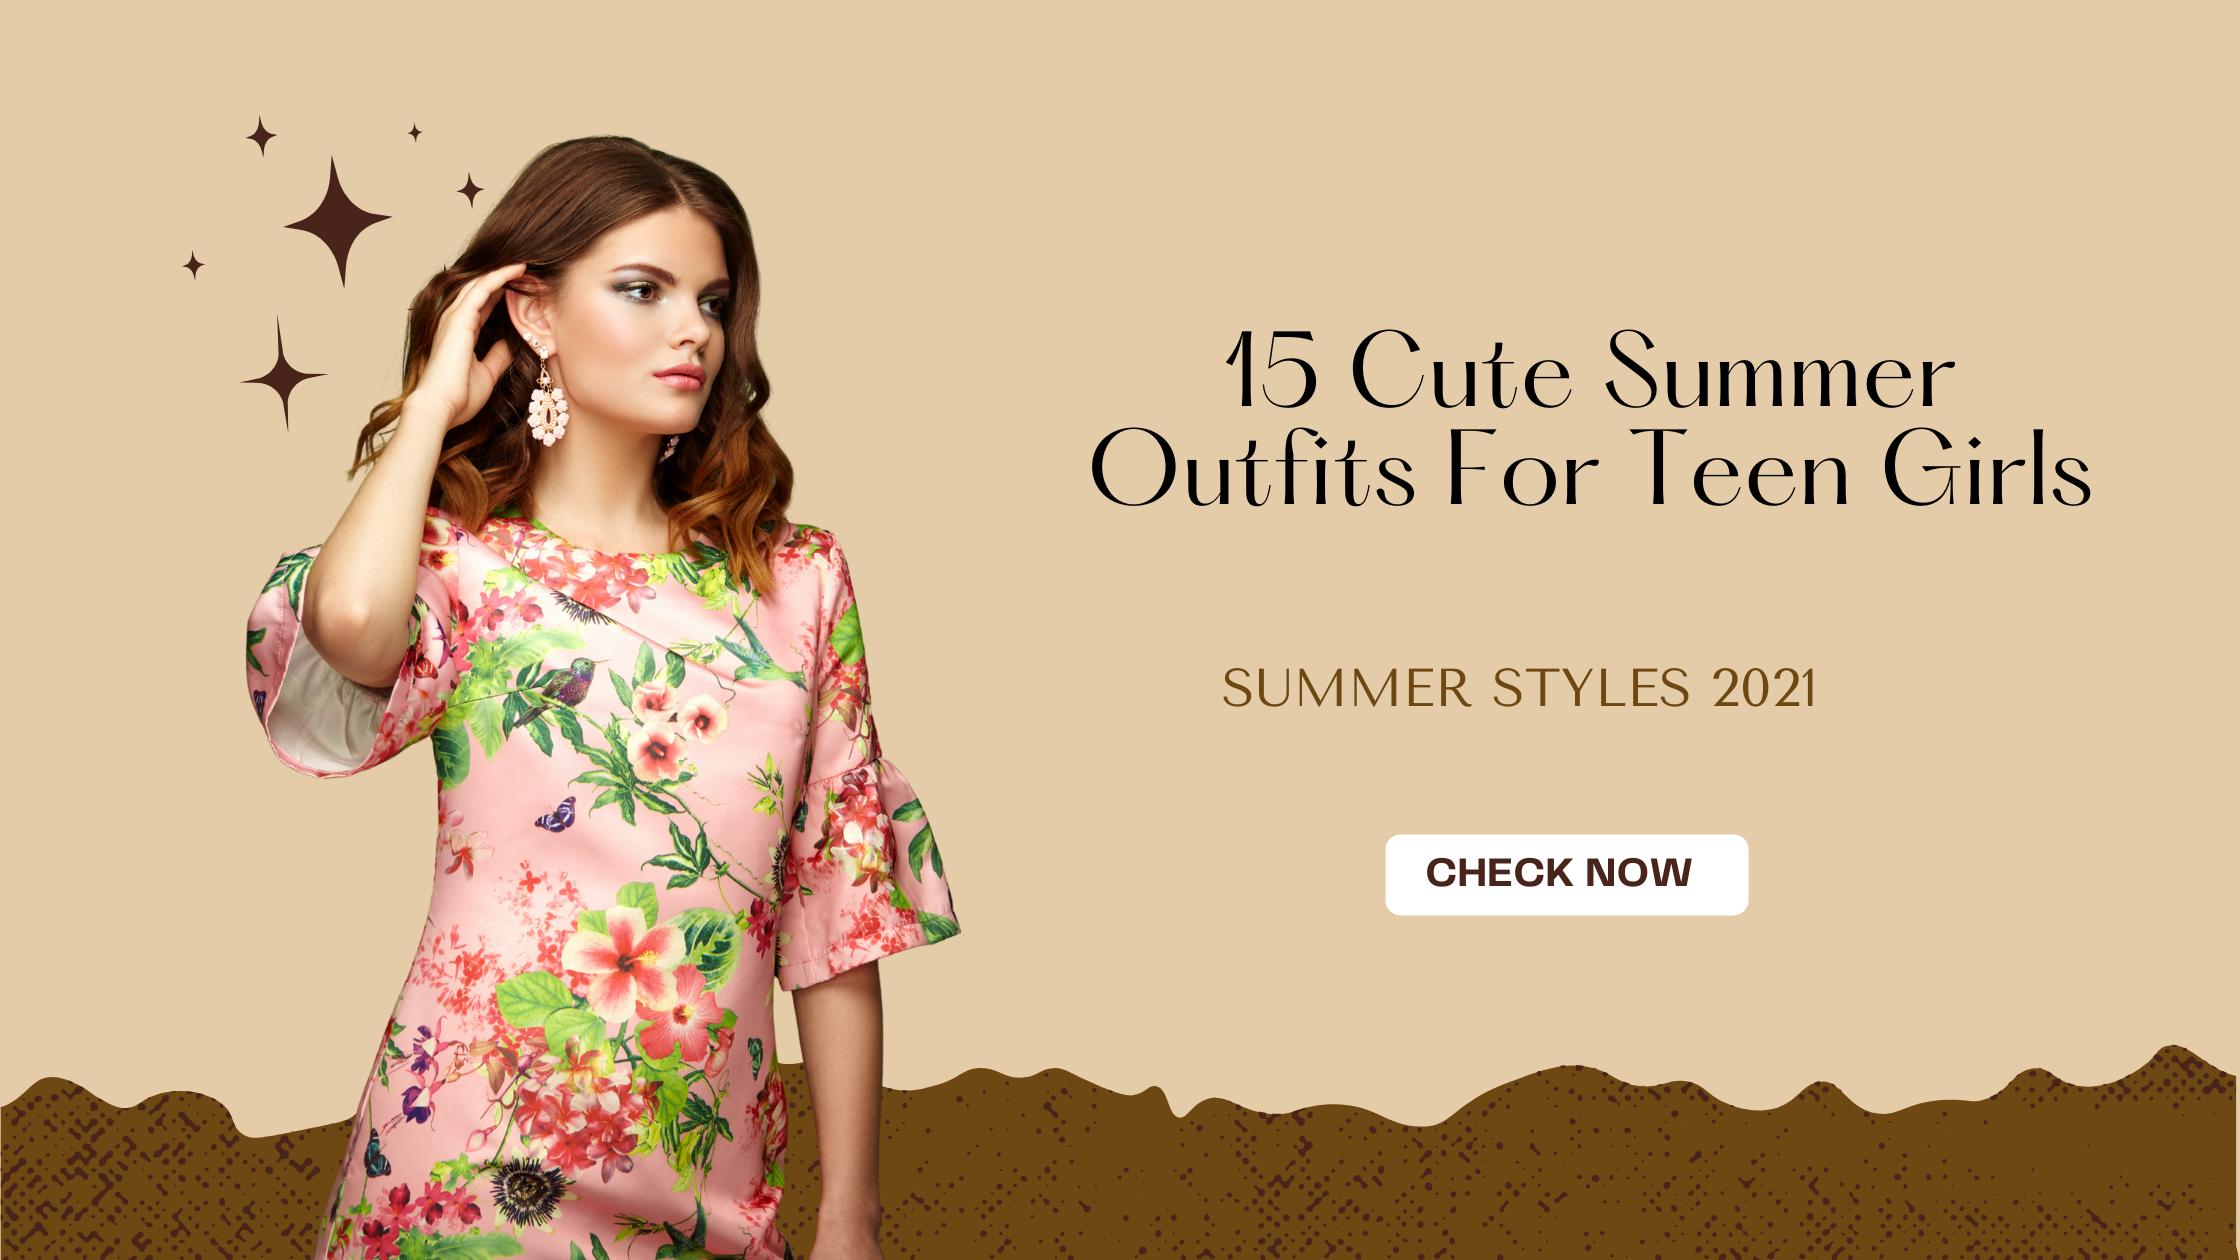 15 Cute Summer Outfits For Teen Girls